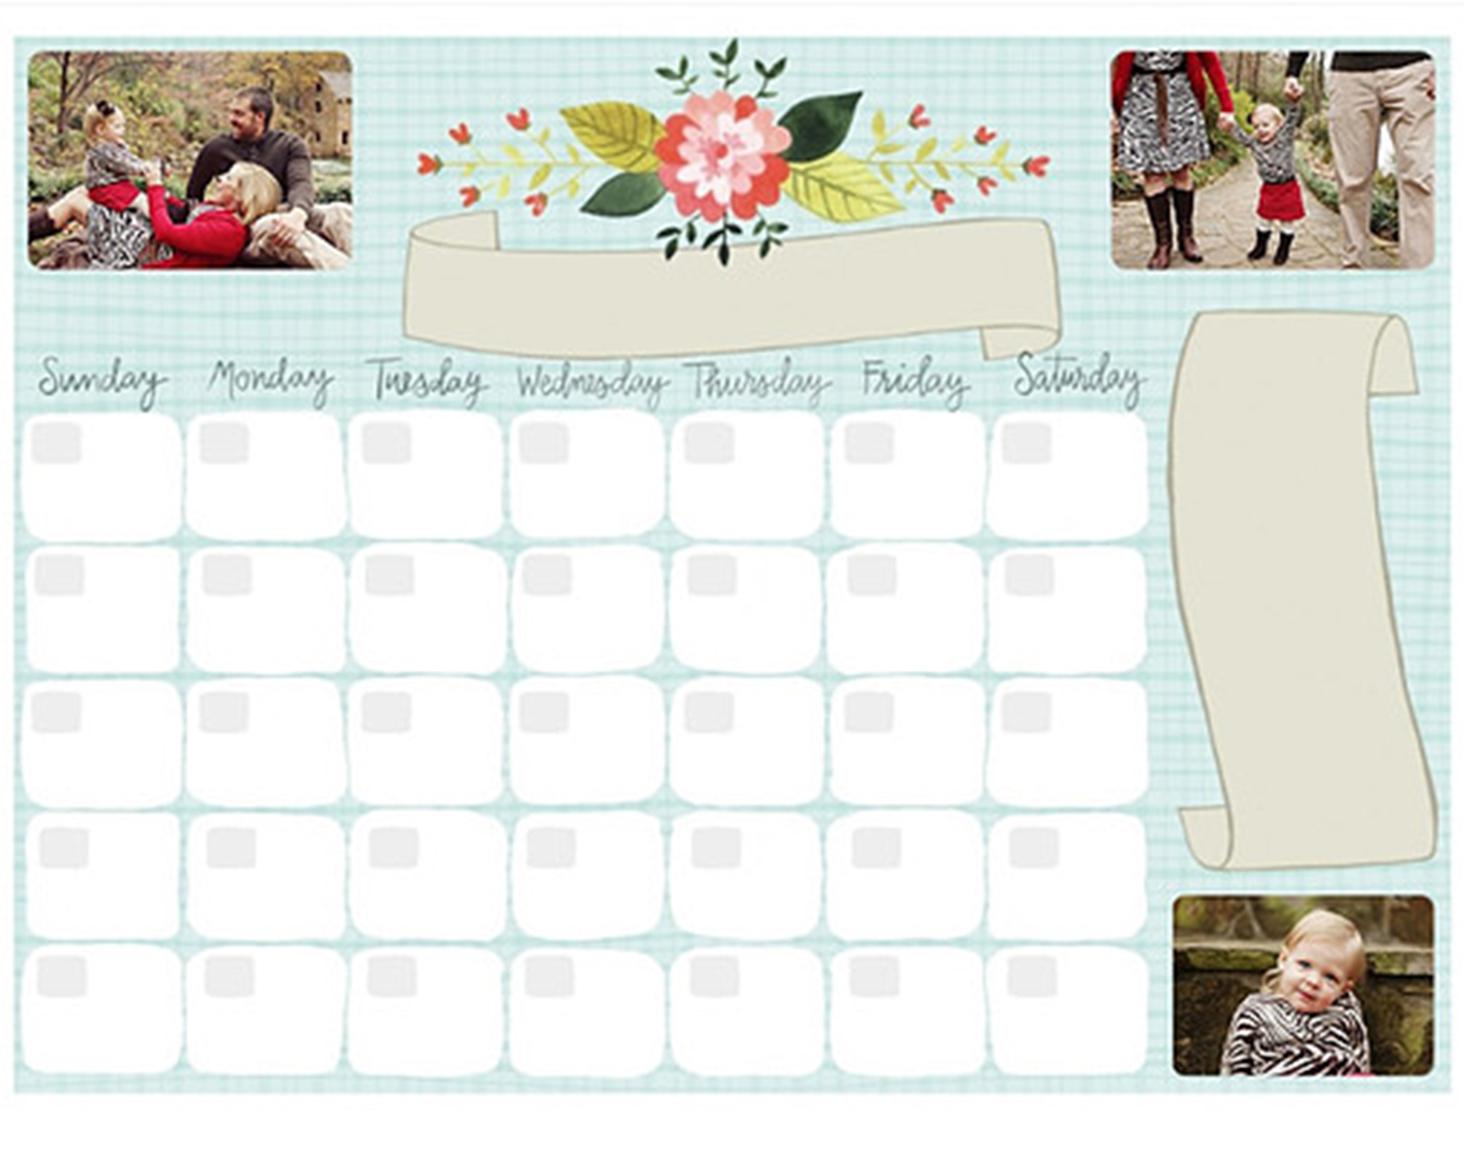 mpix dry erase calendar mothers day gift ideas